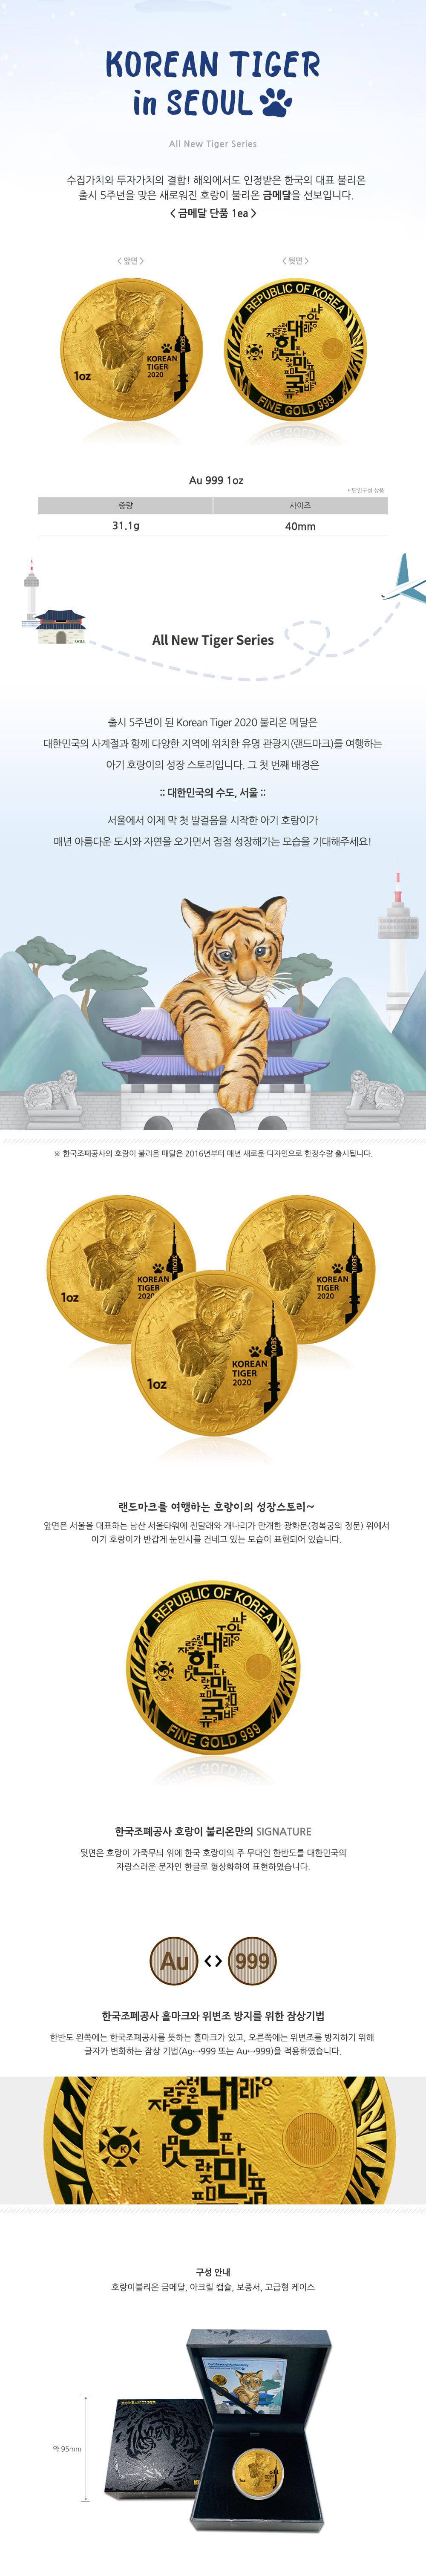 2020_tiger gold coin2.jpg